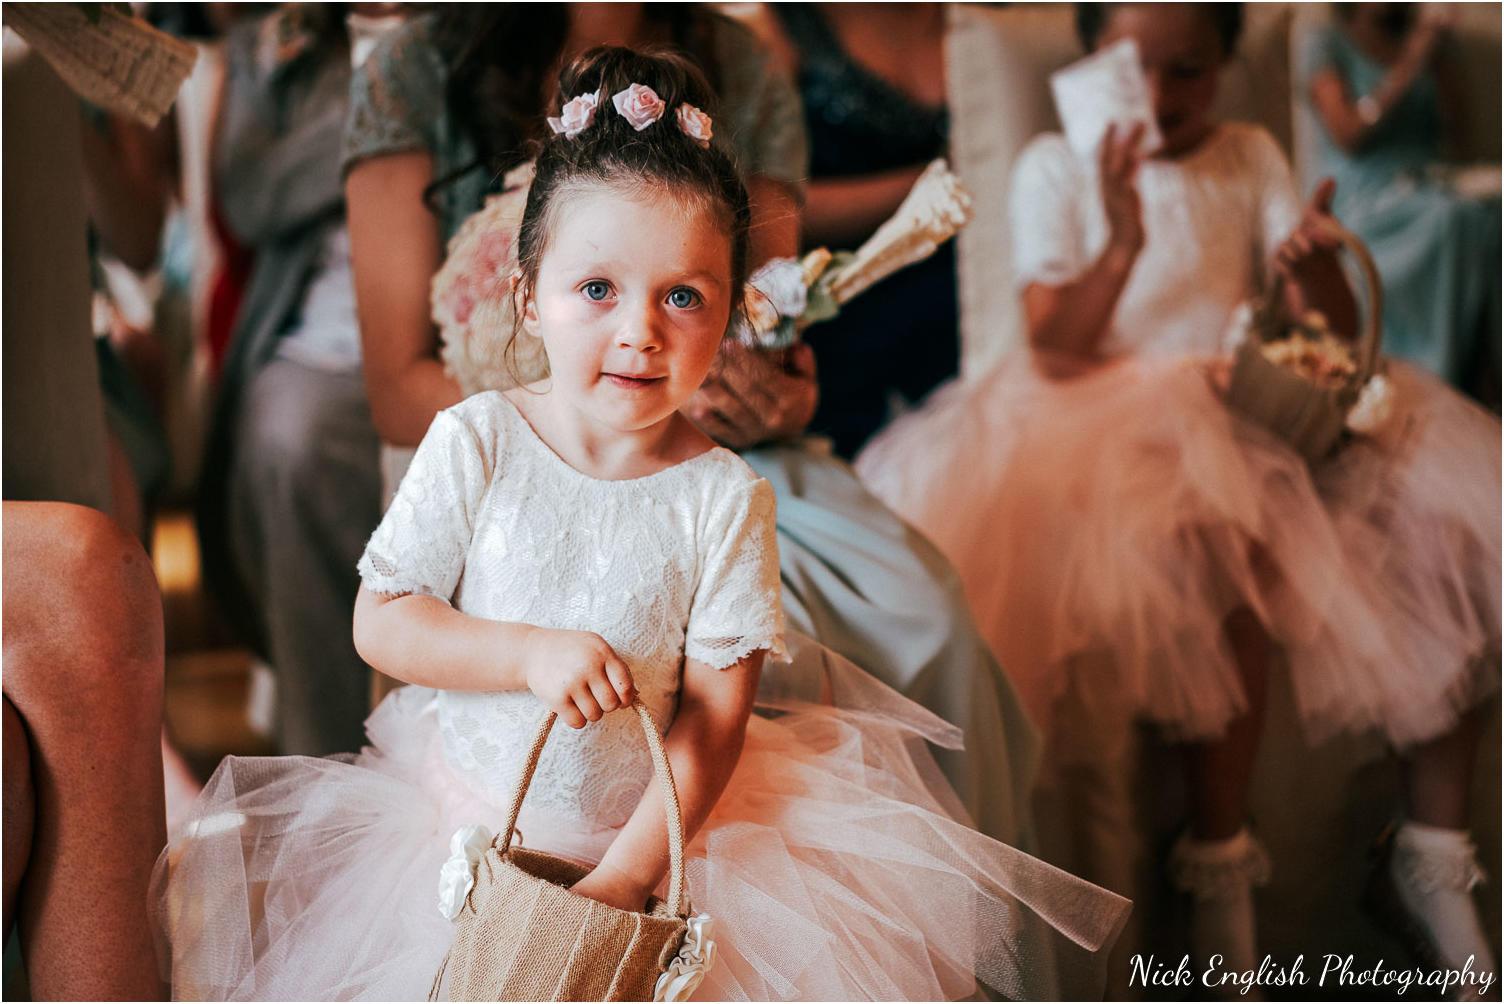 Destination_Wedding_Photographer_Slovenia_Nick_English_Photography-46.jpg